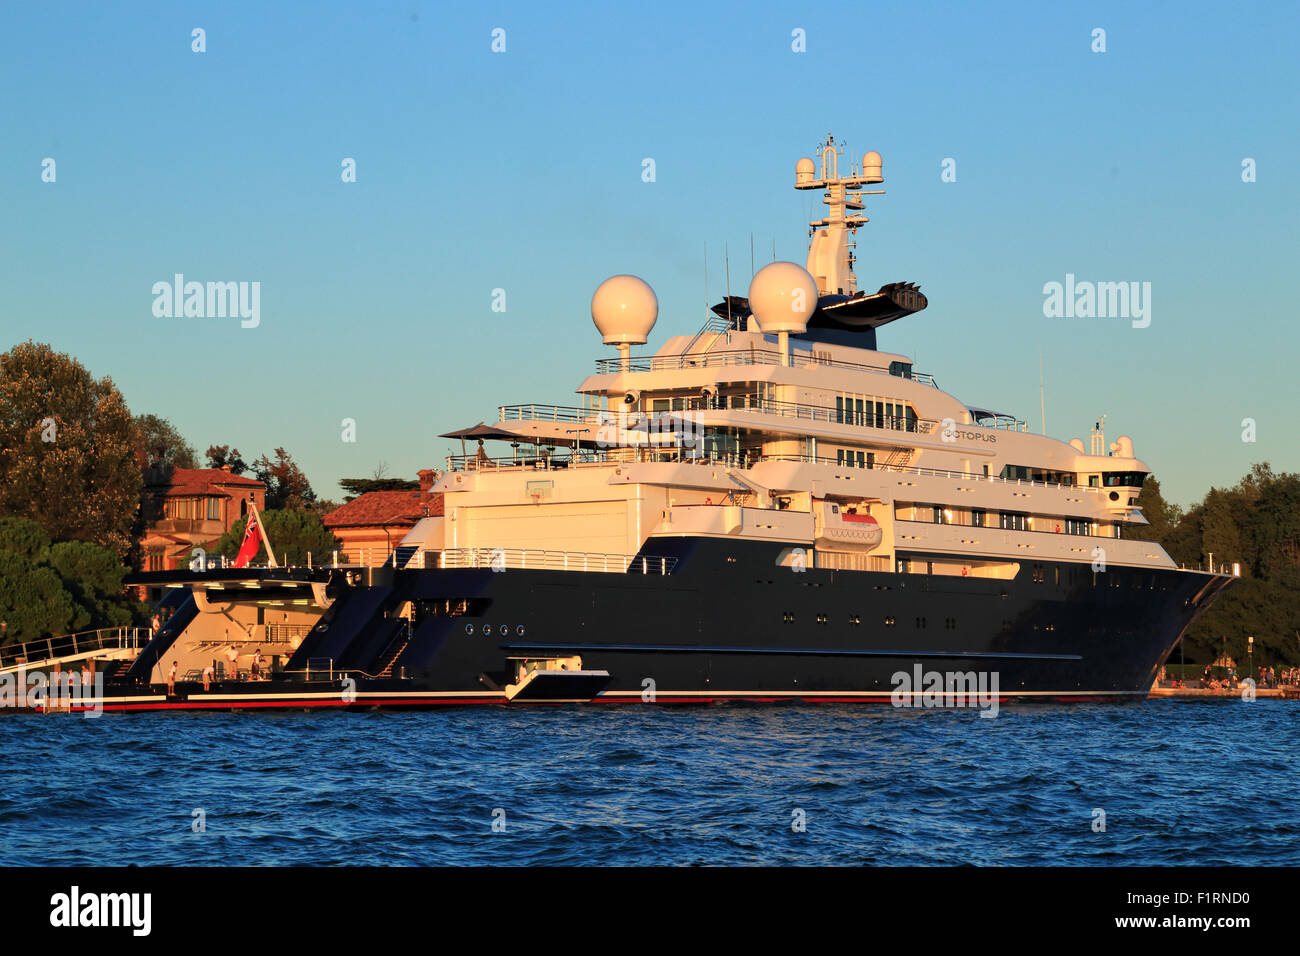 Paul Allen S Yacht Octopus Imo 1007213 Stock Photo 87188220 Alamy